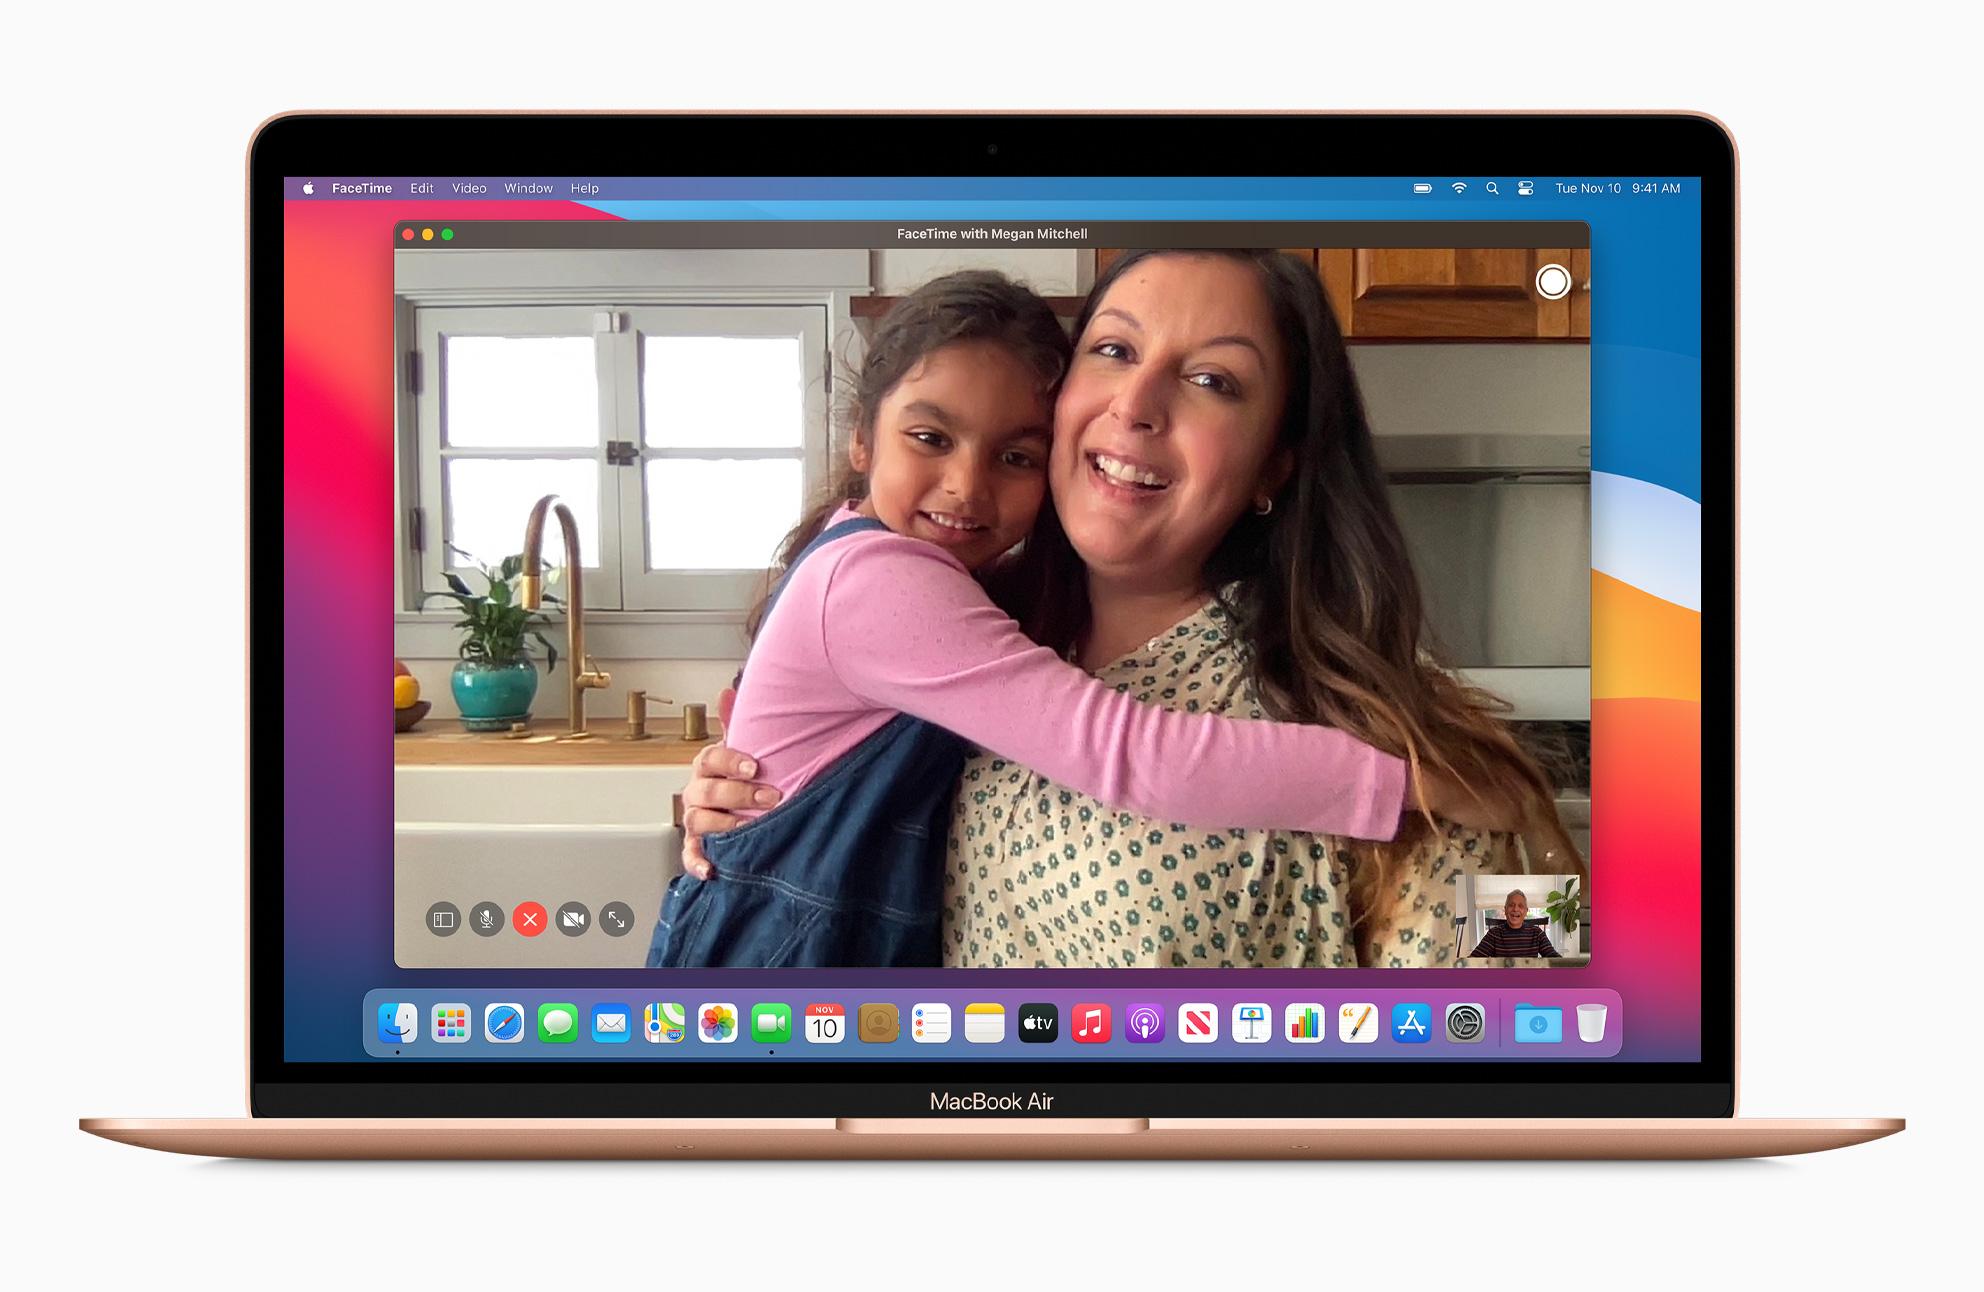 Apple MacBook Air Gold FaceTime